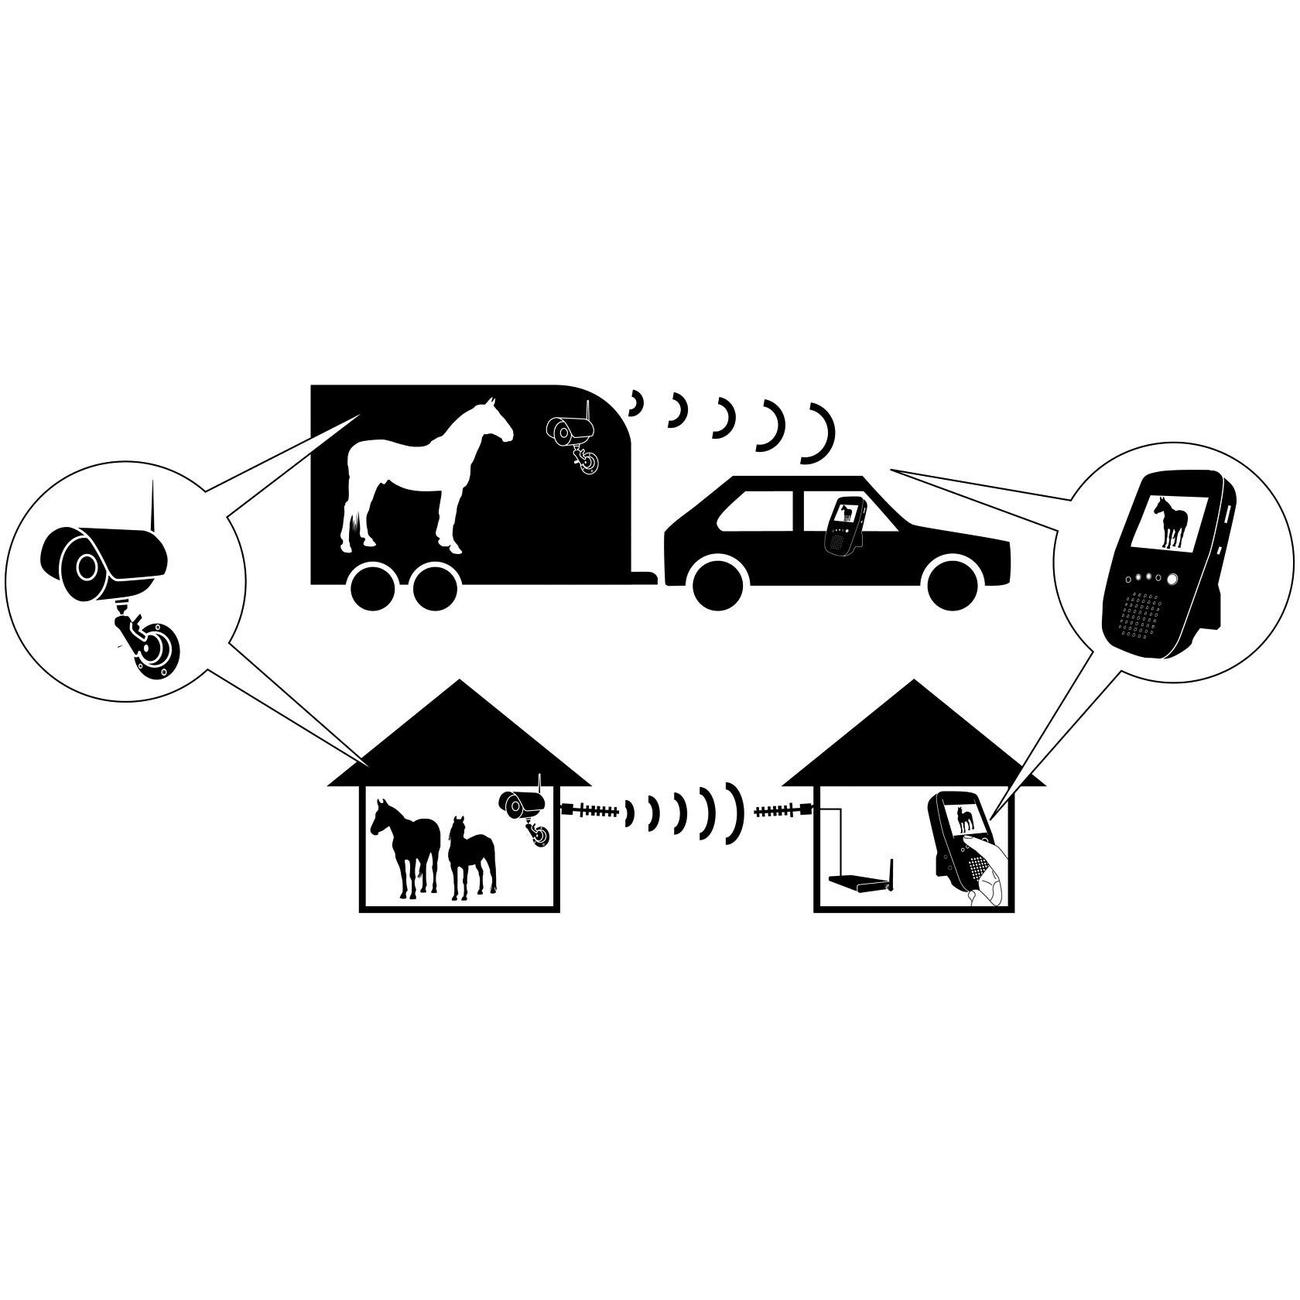 Kerbl Stallkameraset Anhängerkameraset 2,4 GHz, Bild 4